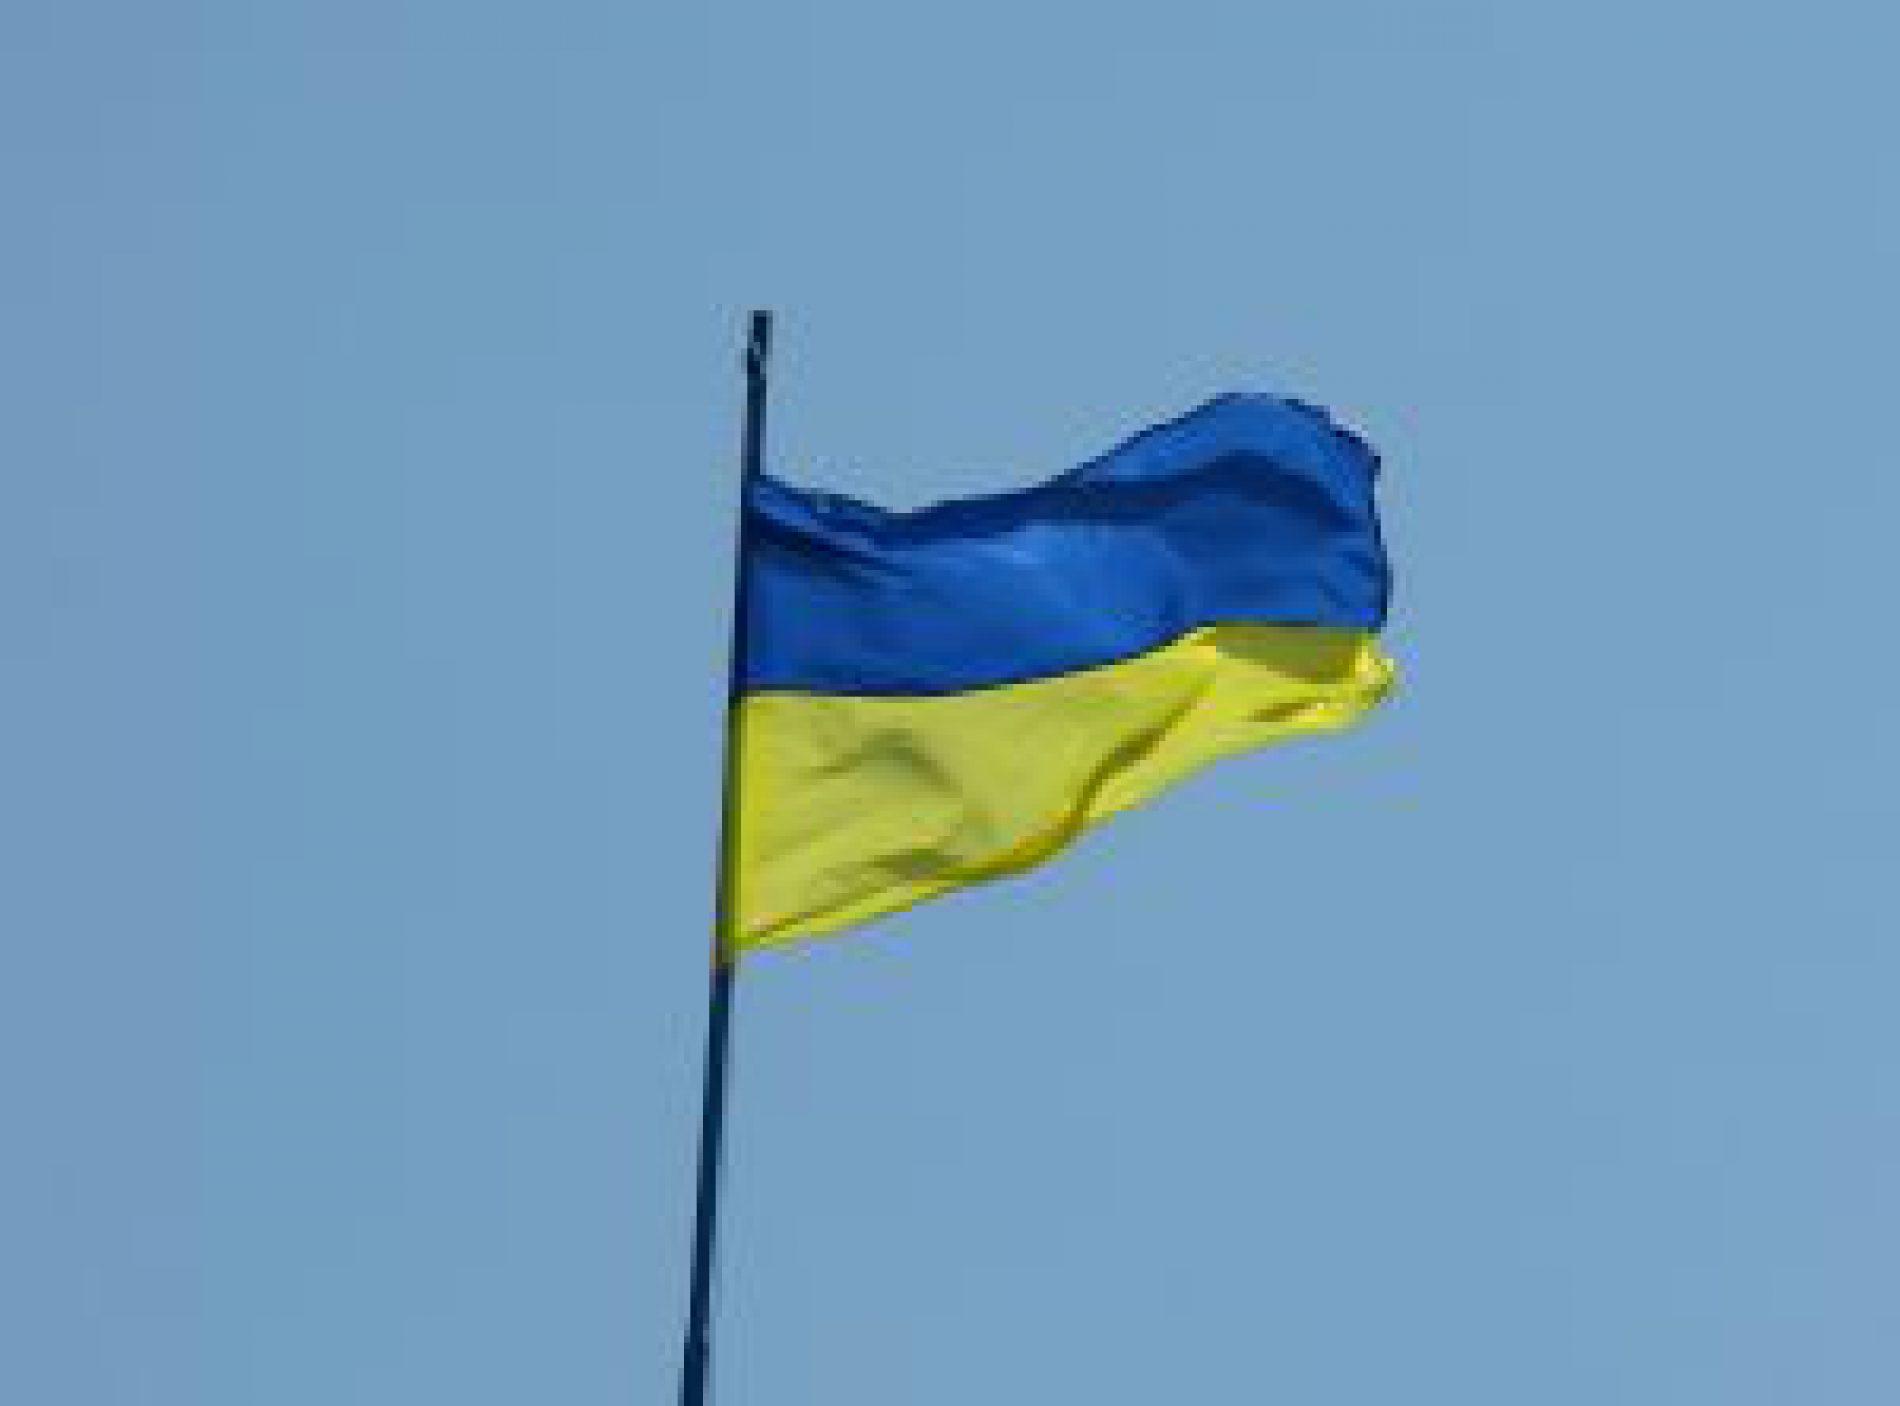 Rośnie liczba ofiar na Ukrainie